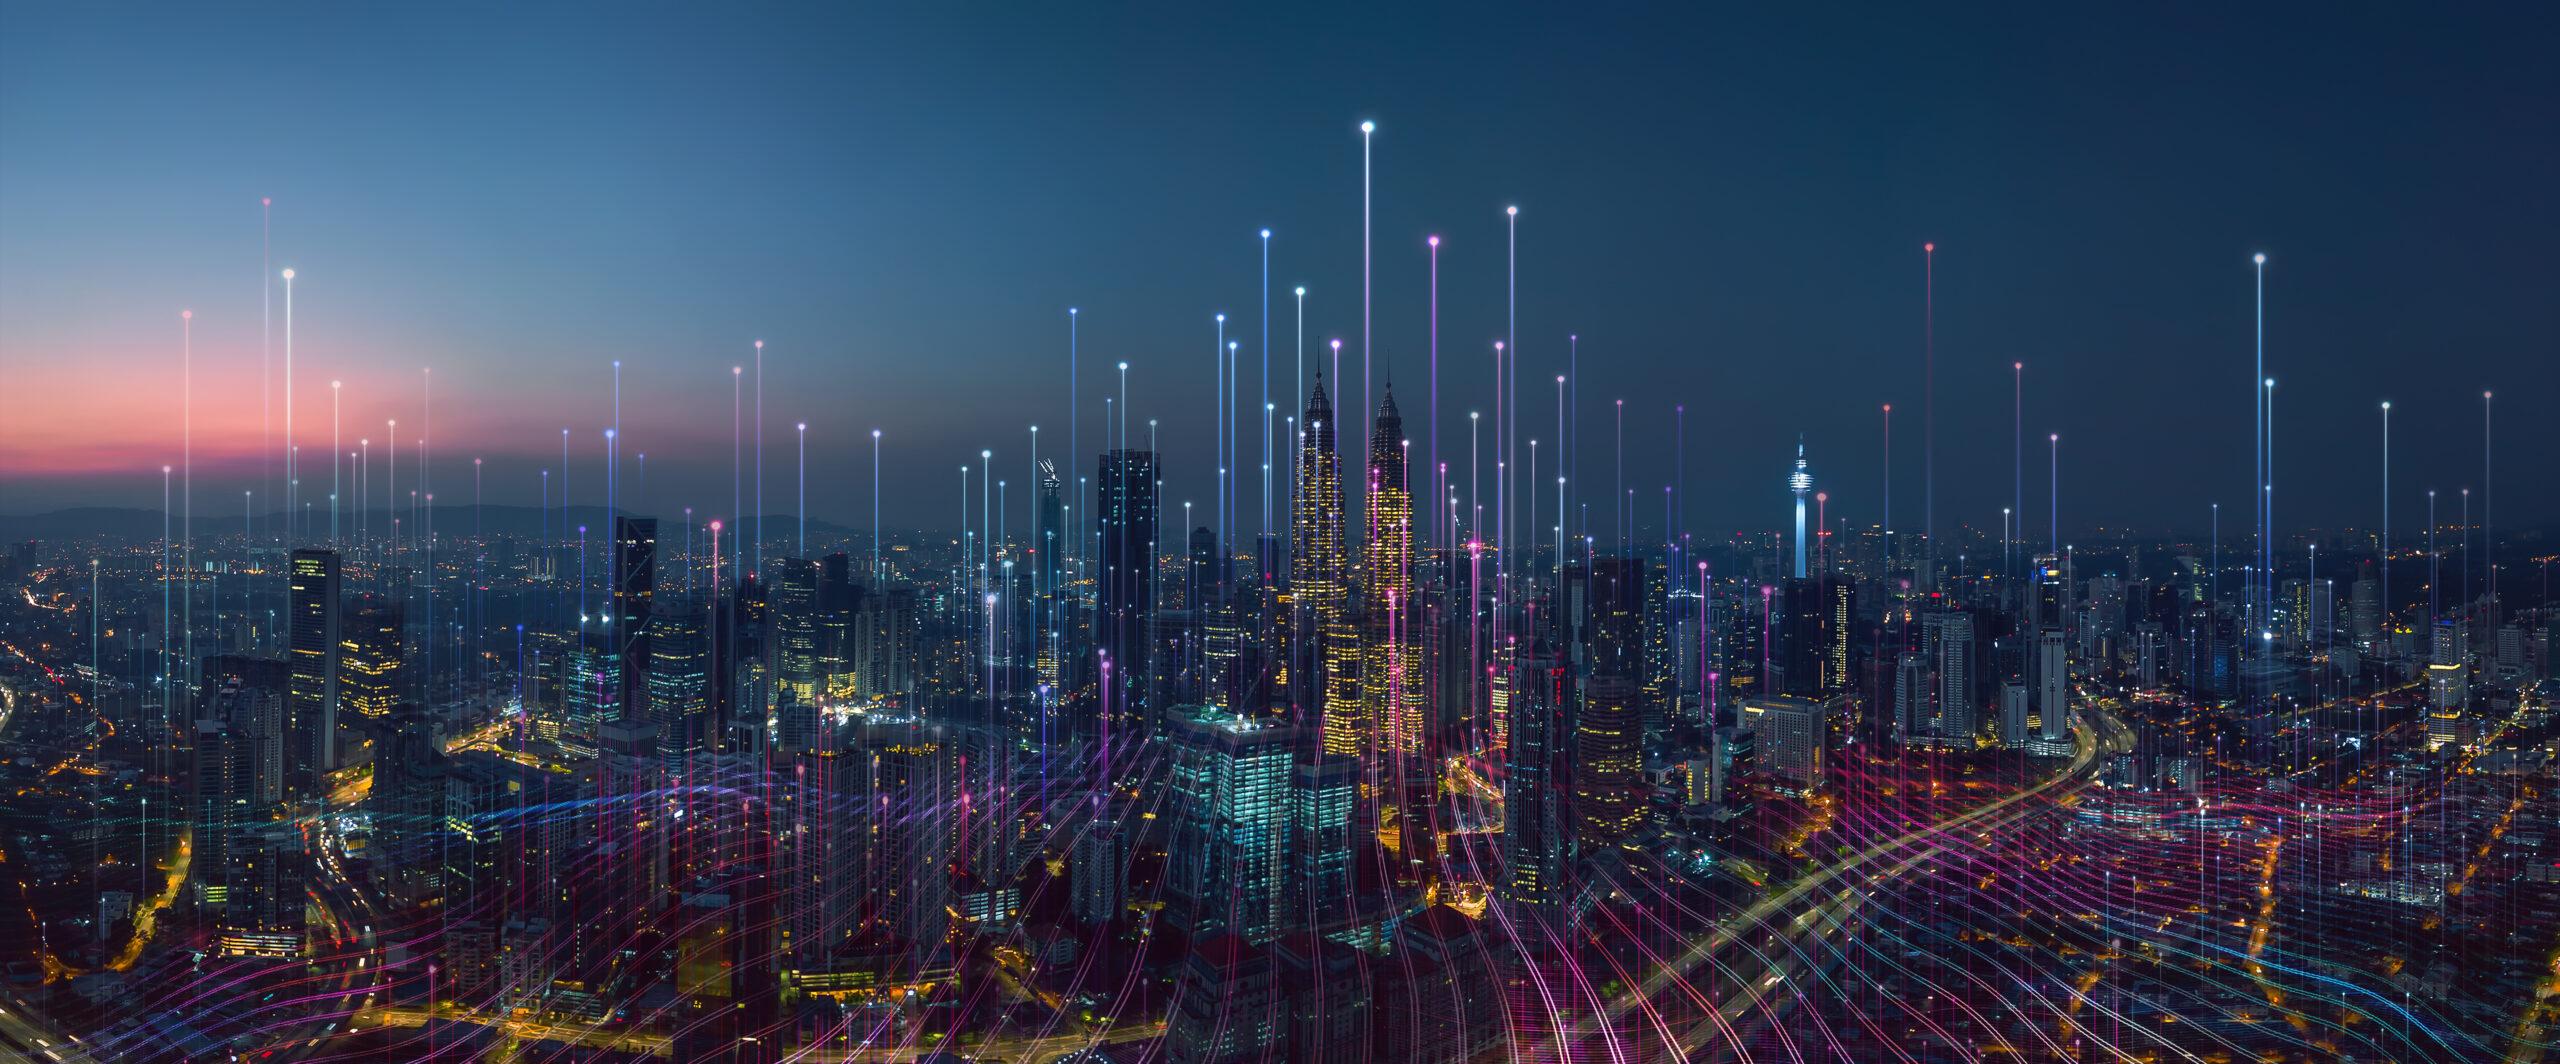 cityscape technology